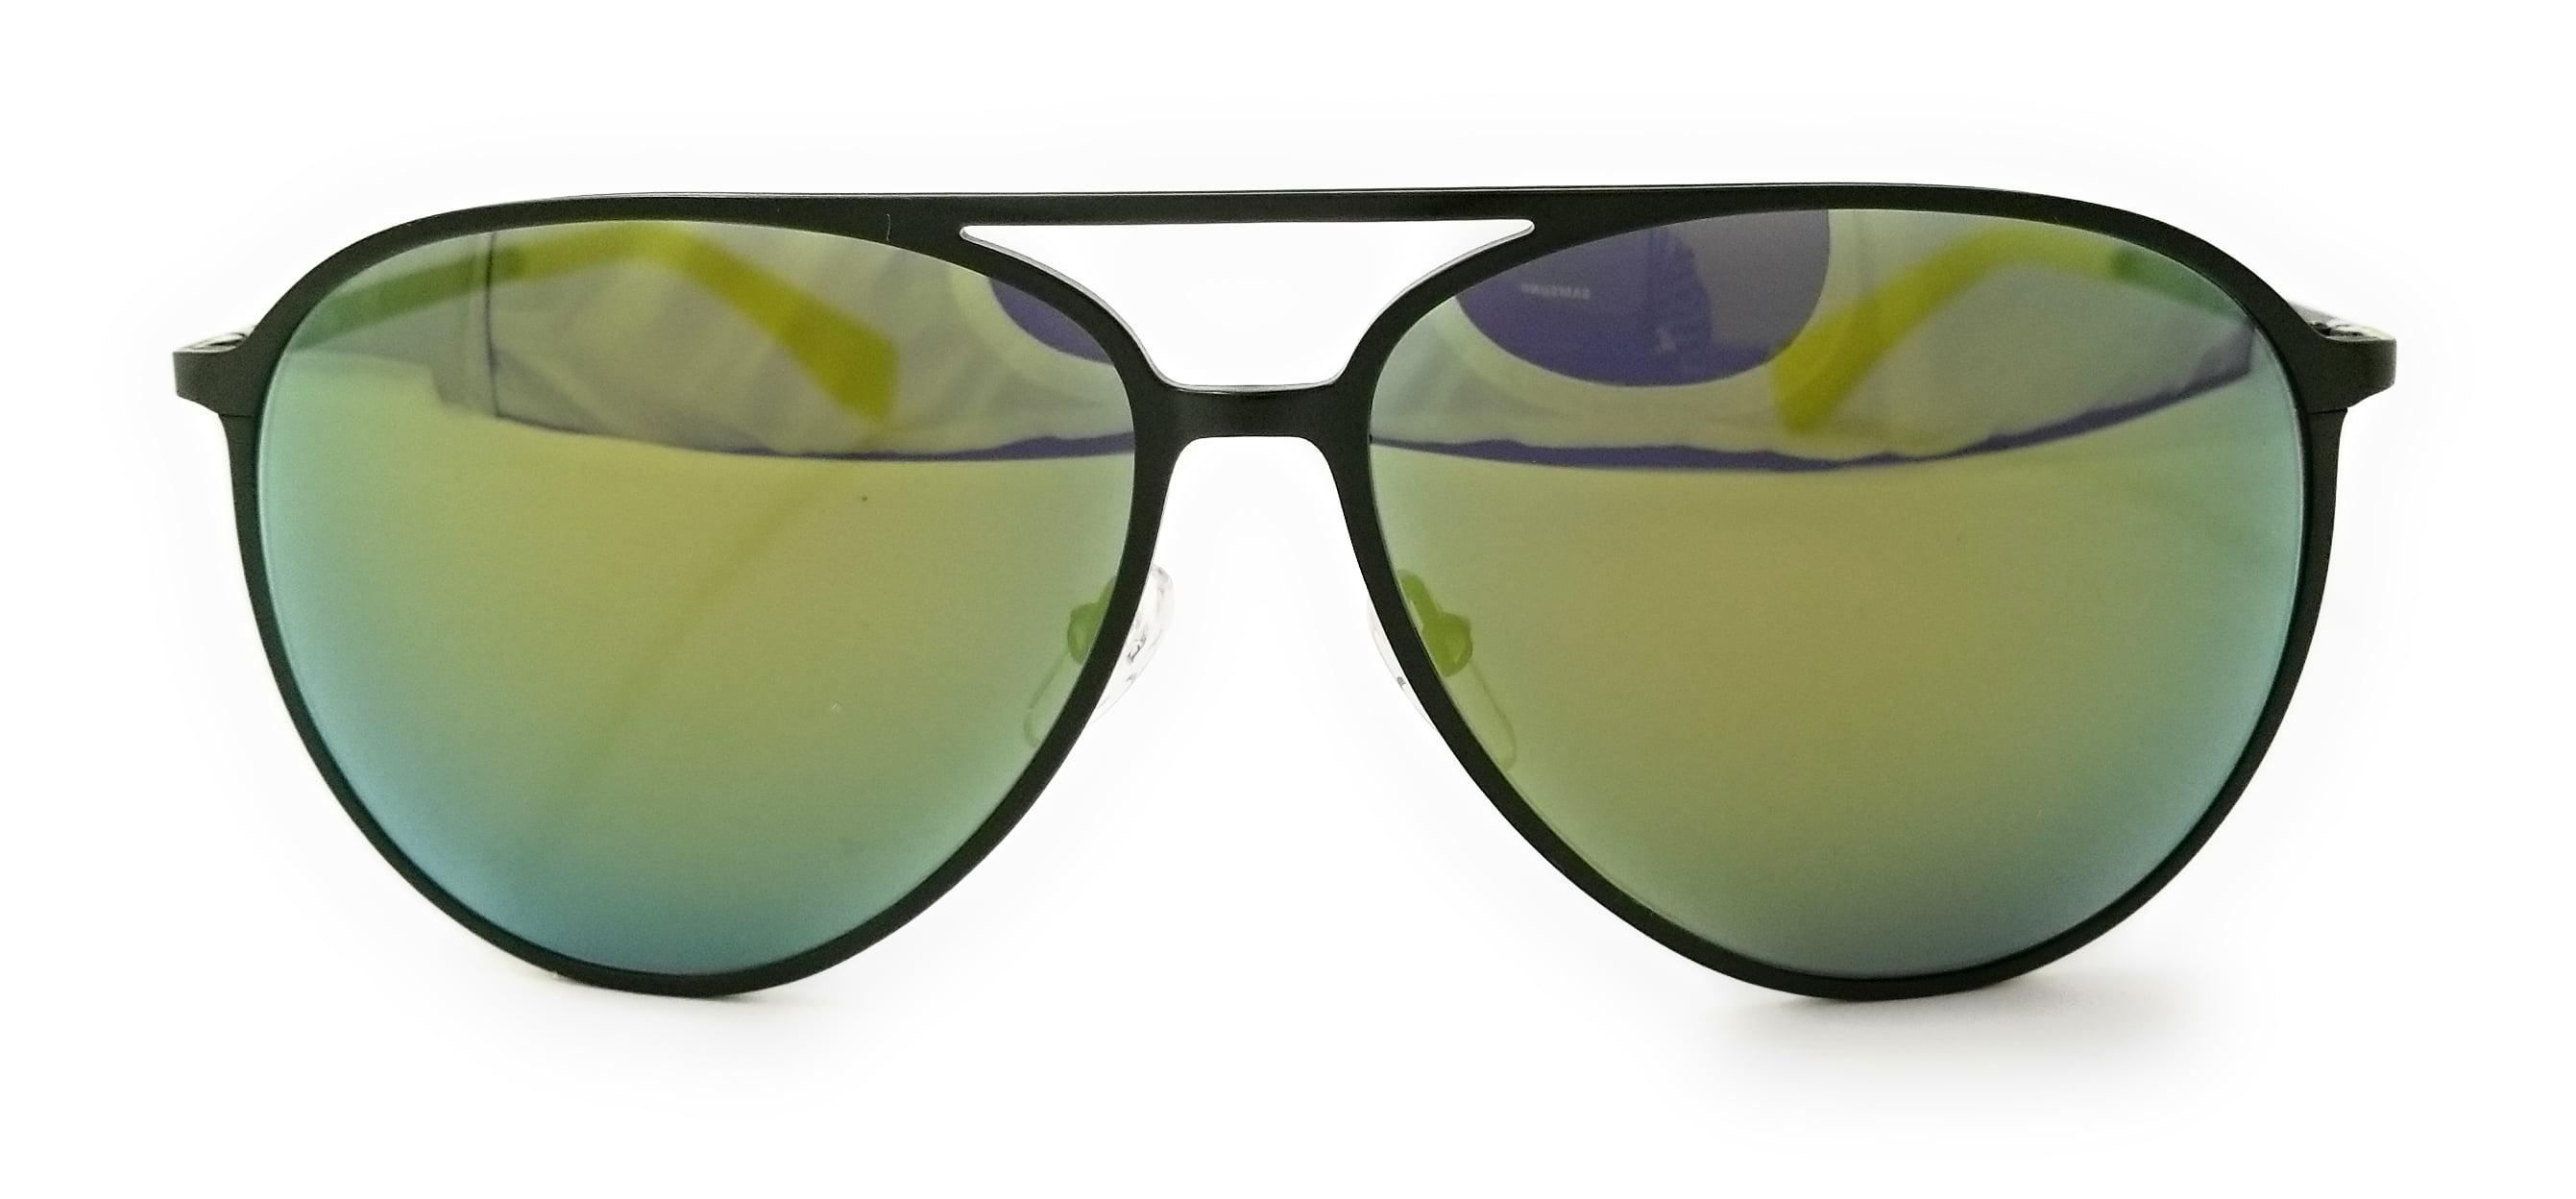 3fc4e041af7 Lacoste - LACOSTE Sunglasses L179S 315 Satin Green Aviator Unisex 59x13x140  - Walmart.com